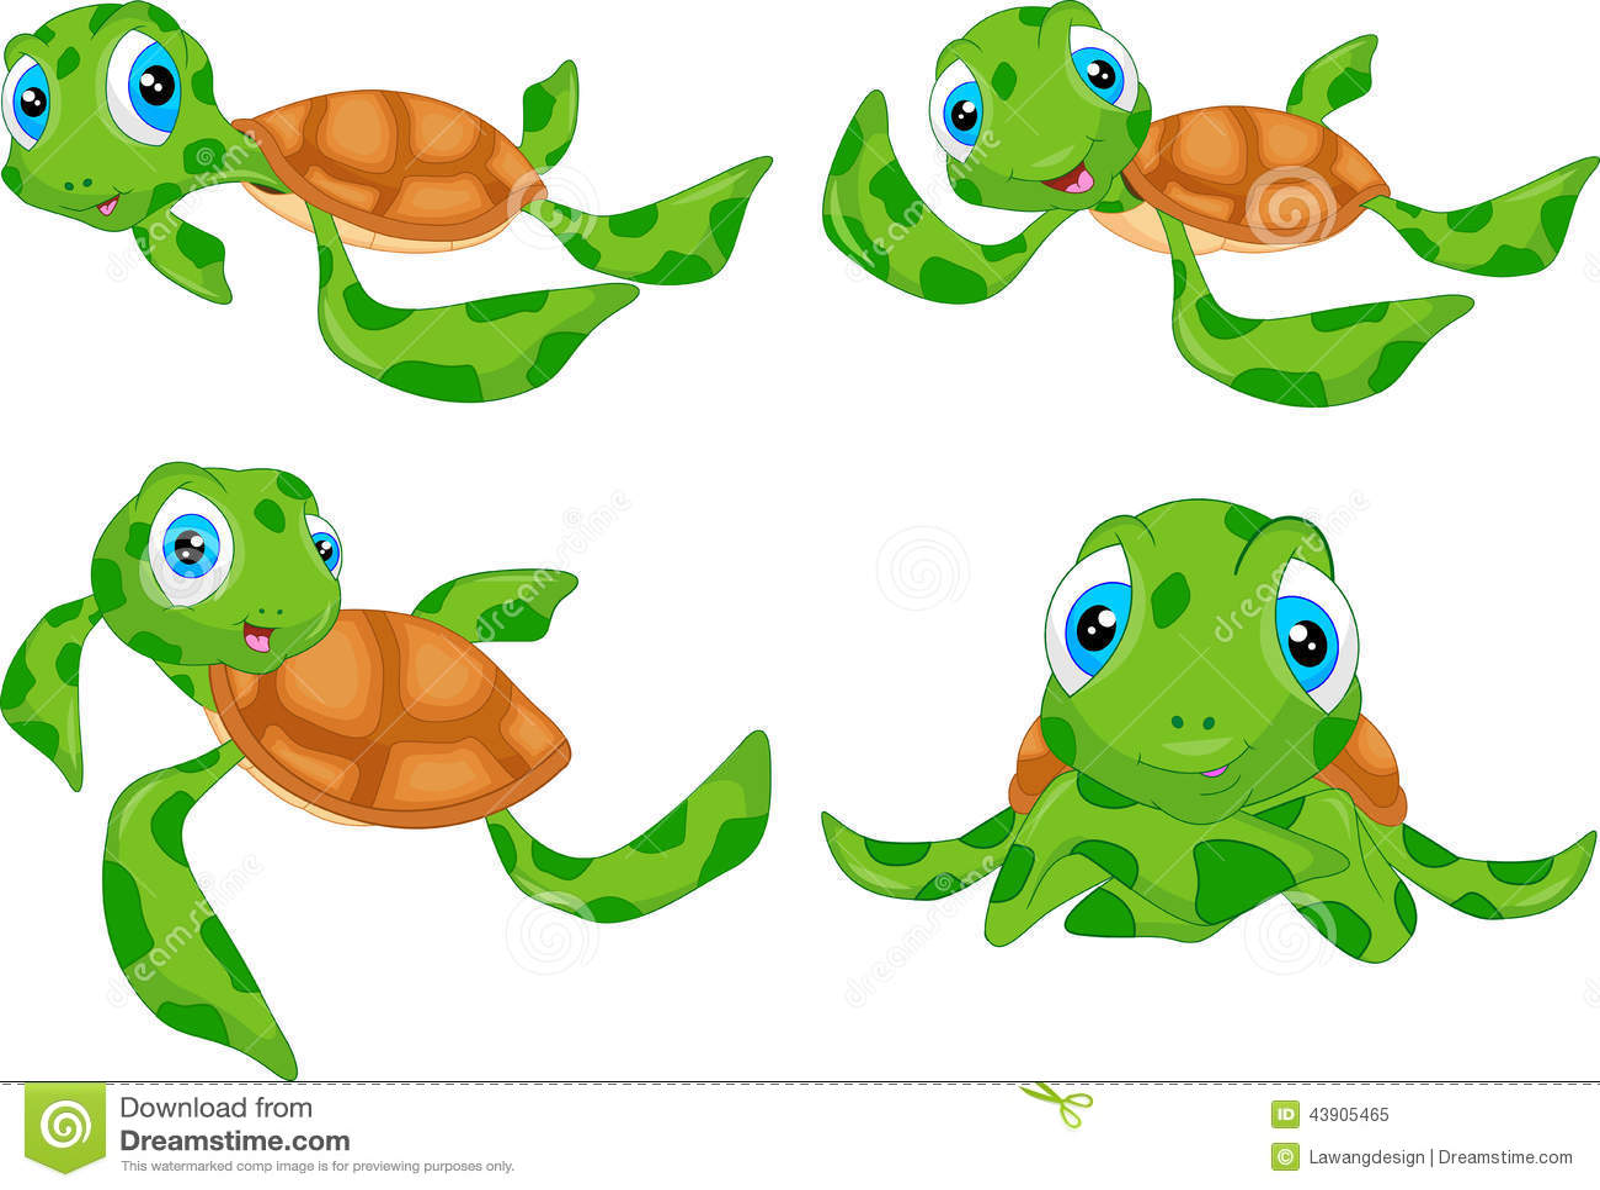 Cute animated sea turtles - photo#25